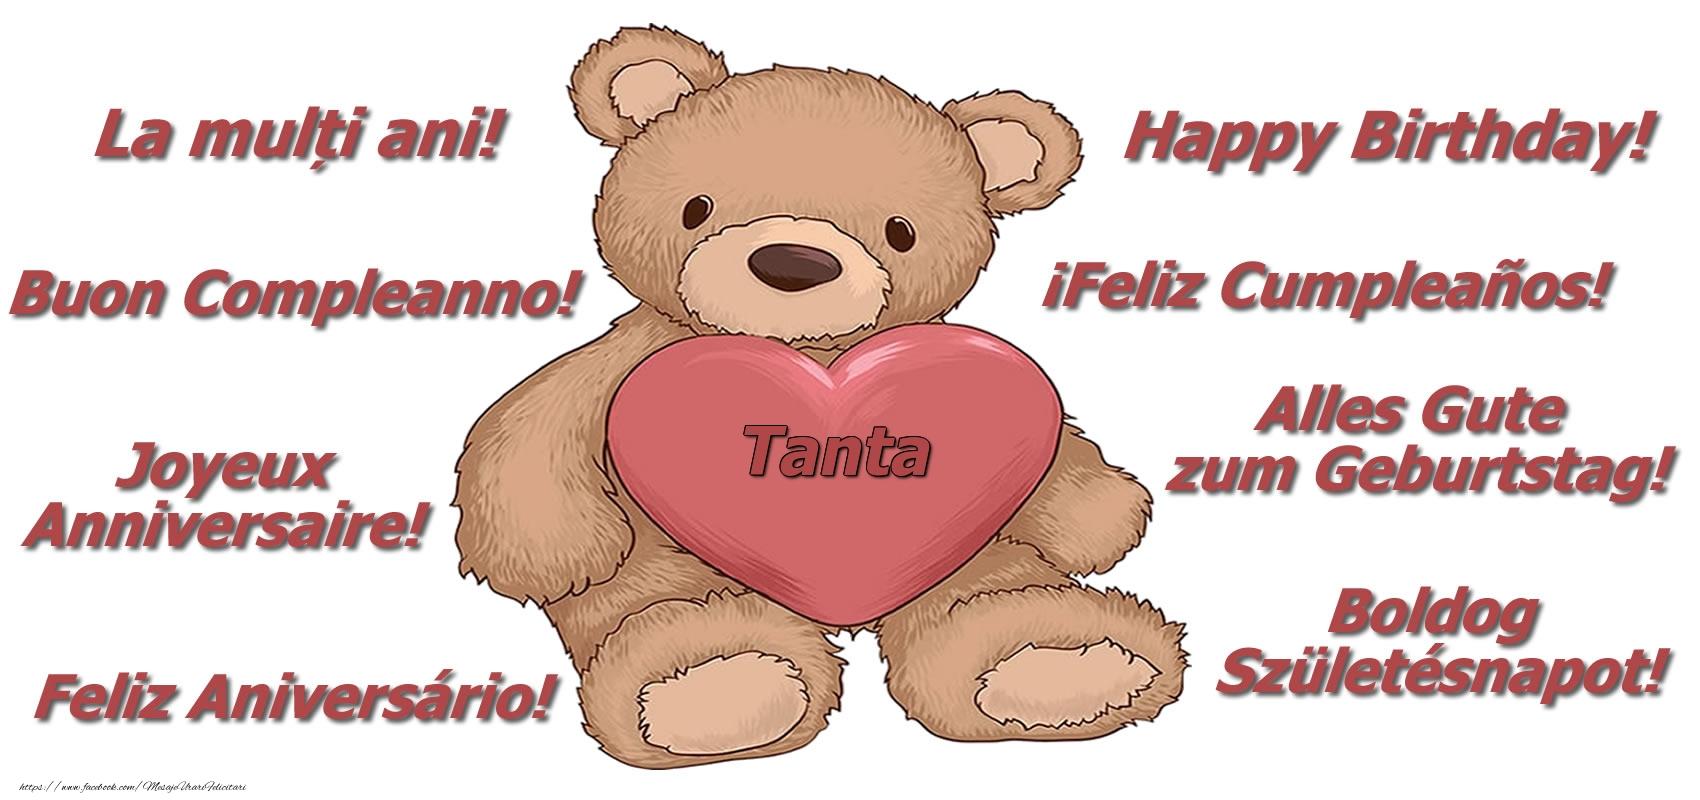 Felicitari de zi de nastere - La multi ani Tanta! - Ursulet